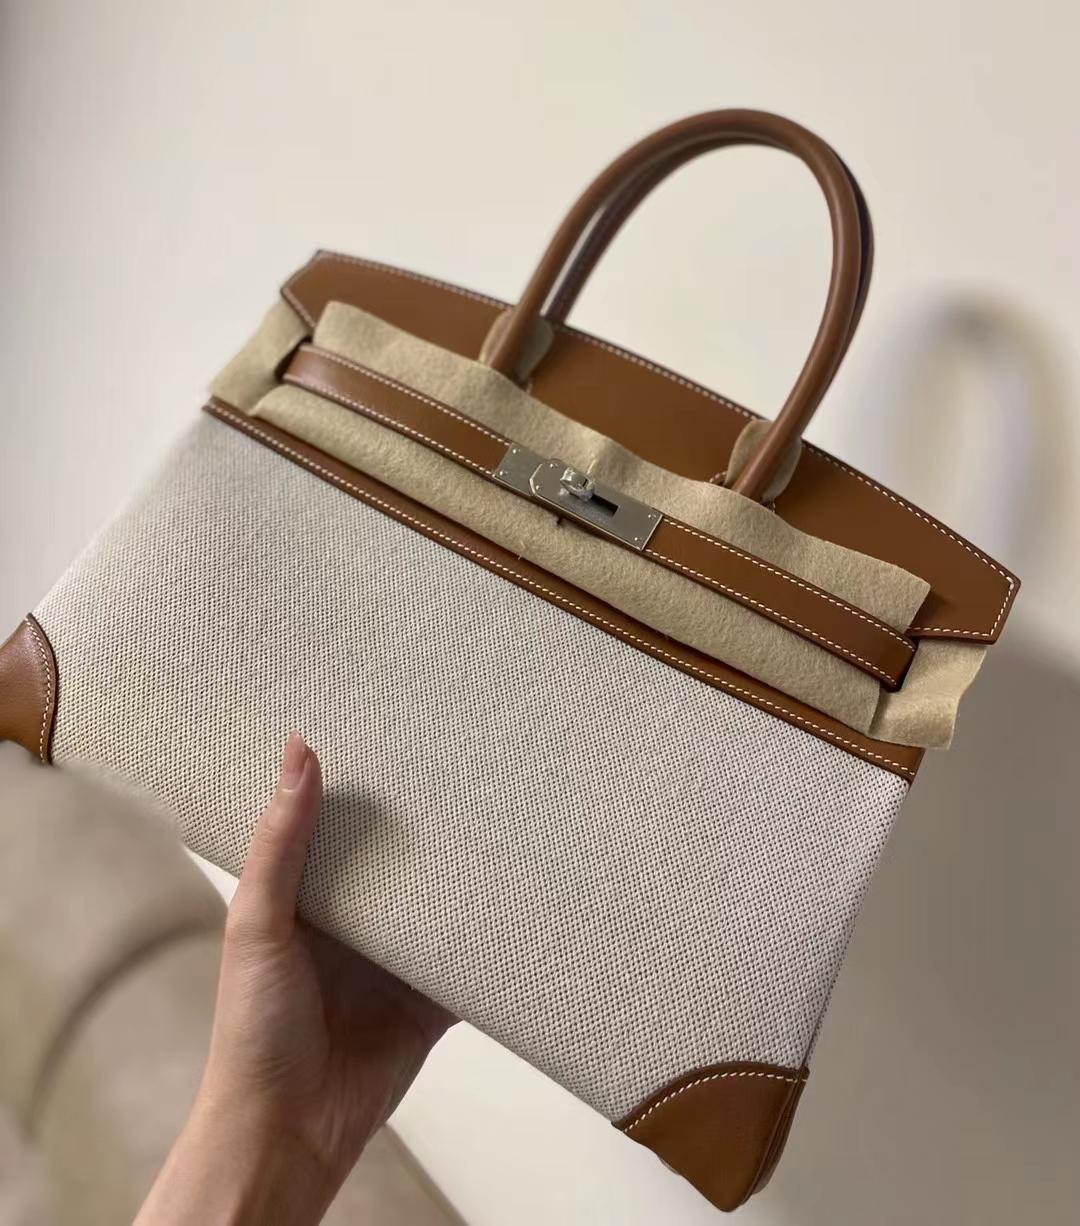 Hermès(爱马仕)Birkin 铂金包 Swift 拼 帆布 银扣 30cm